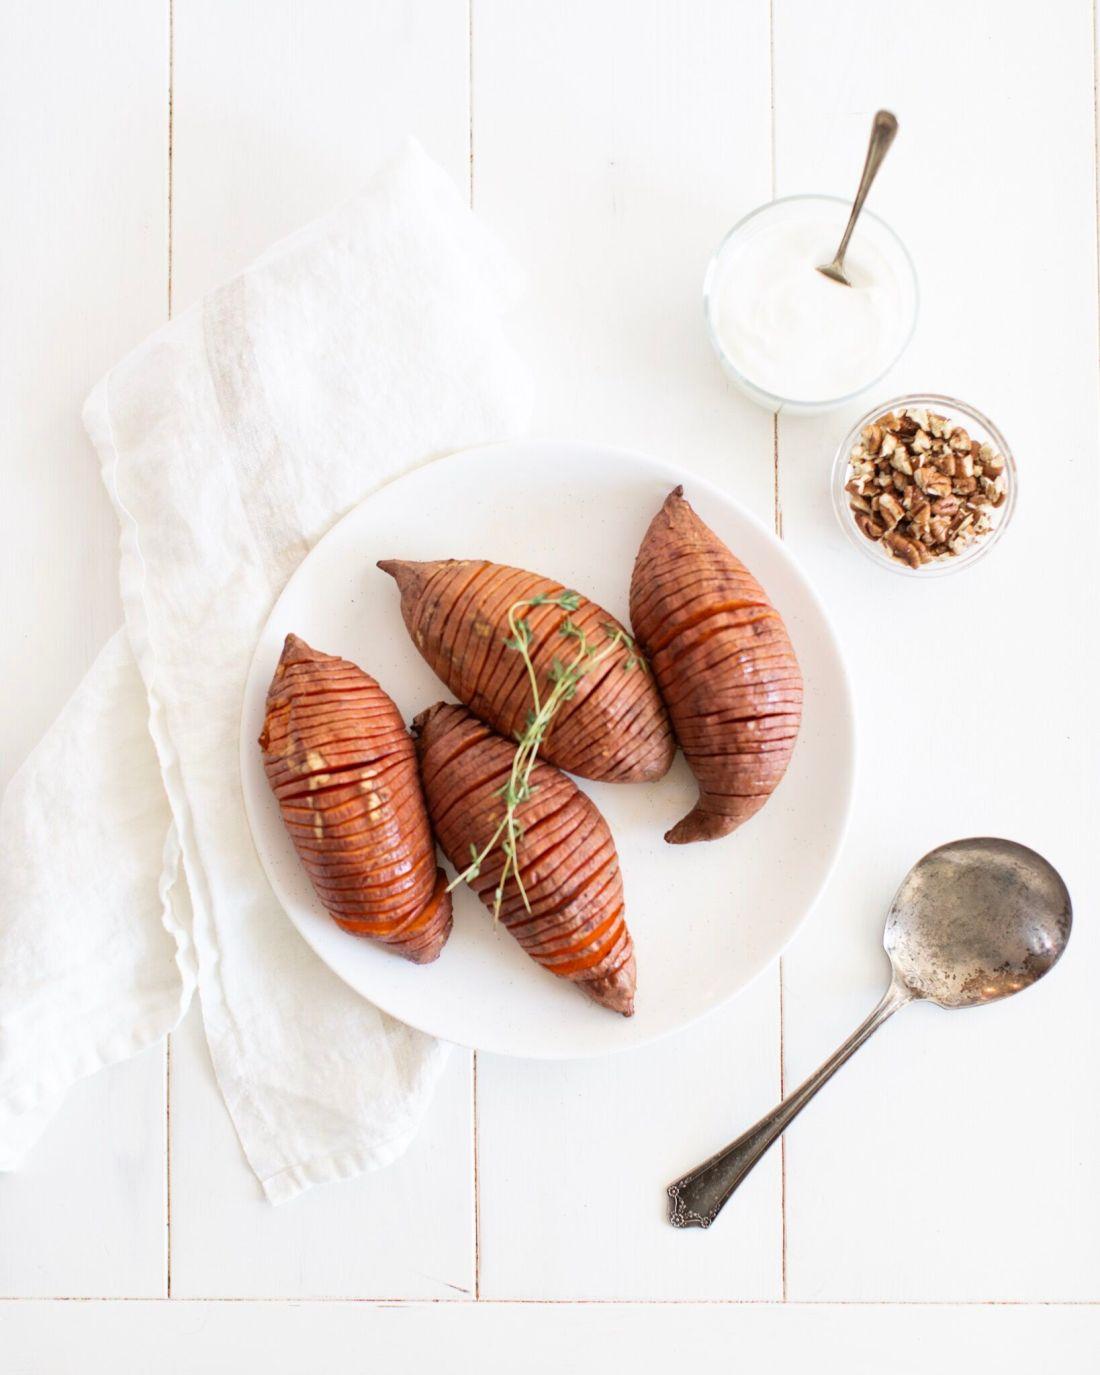 Healthy Maple Hasselback Sweet Potatoes